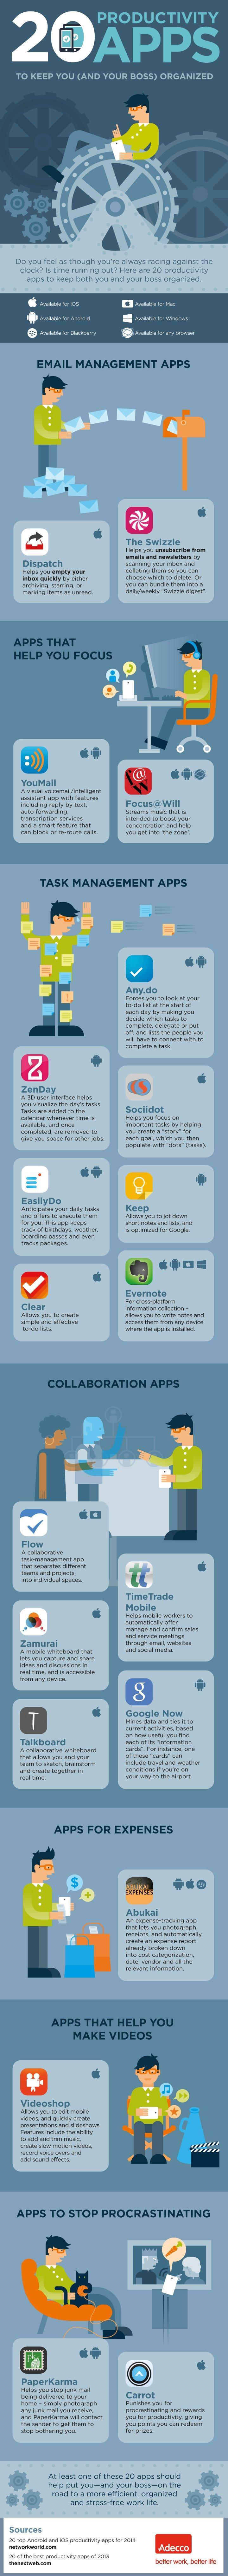 app-produttivita-startup-infografica